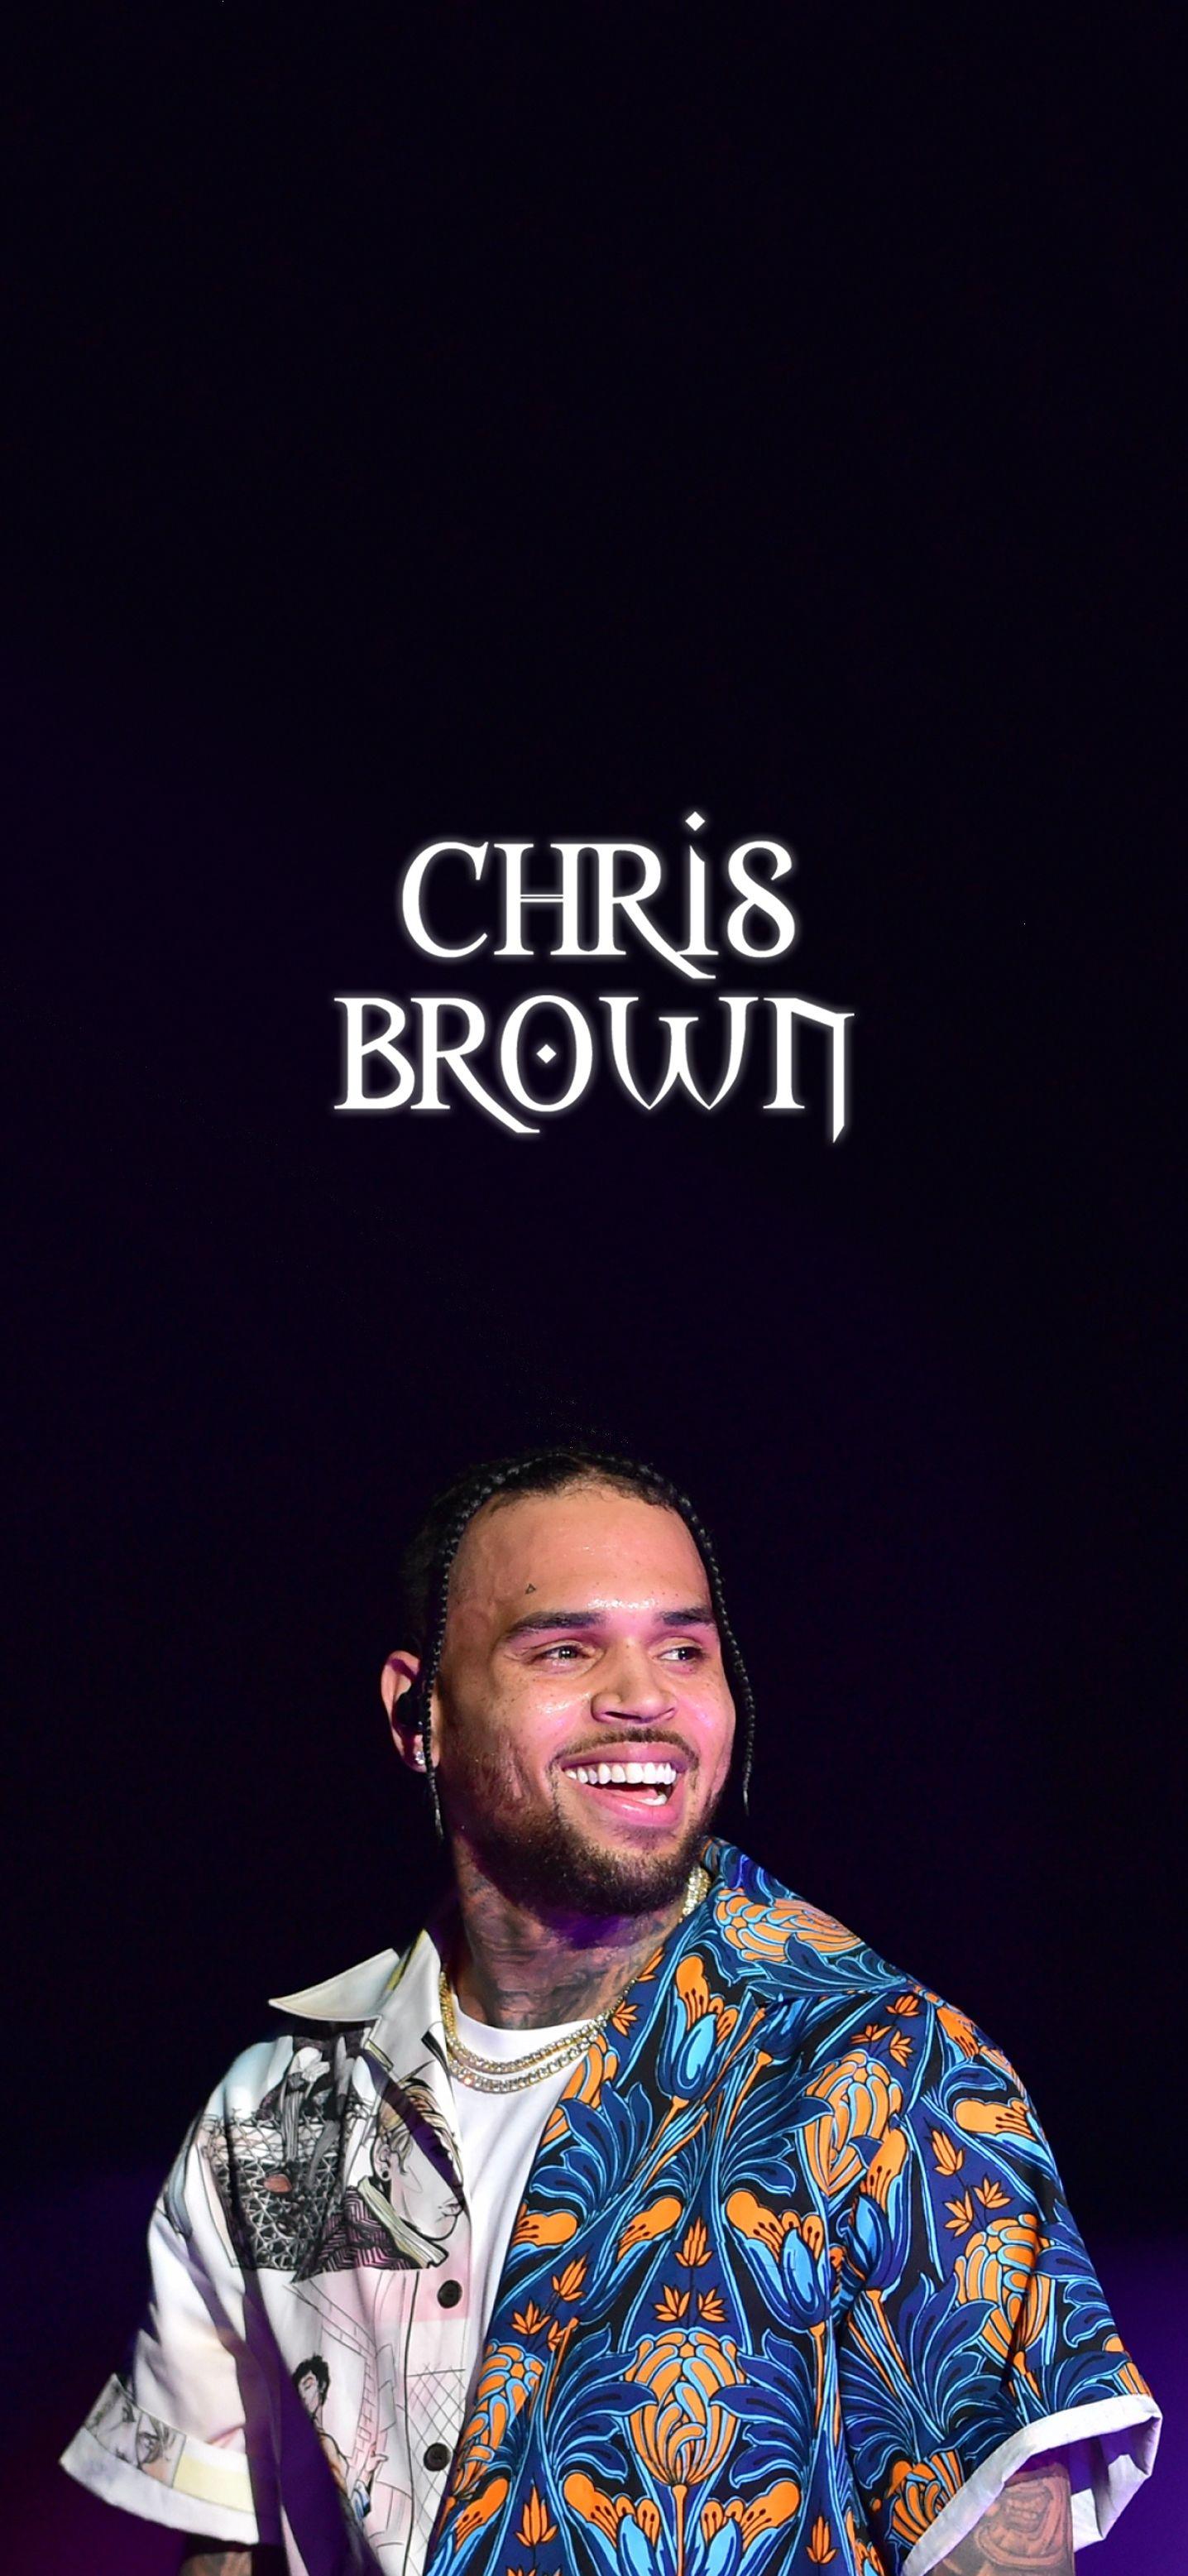 Chris Brown Wallpaper In 2021 Chris Brown Wallpaper Chris Brown Tyga Chris Brown